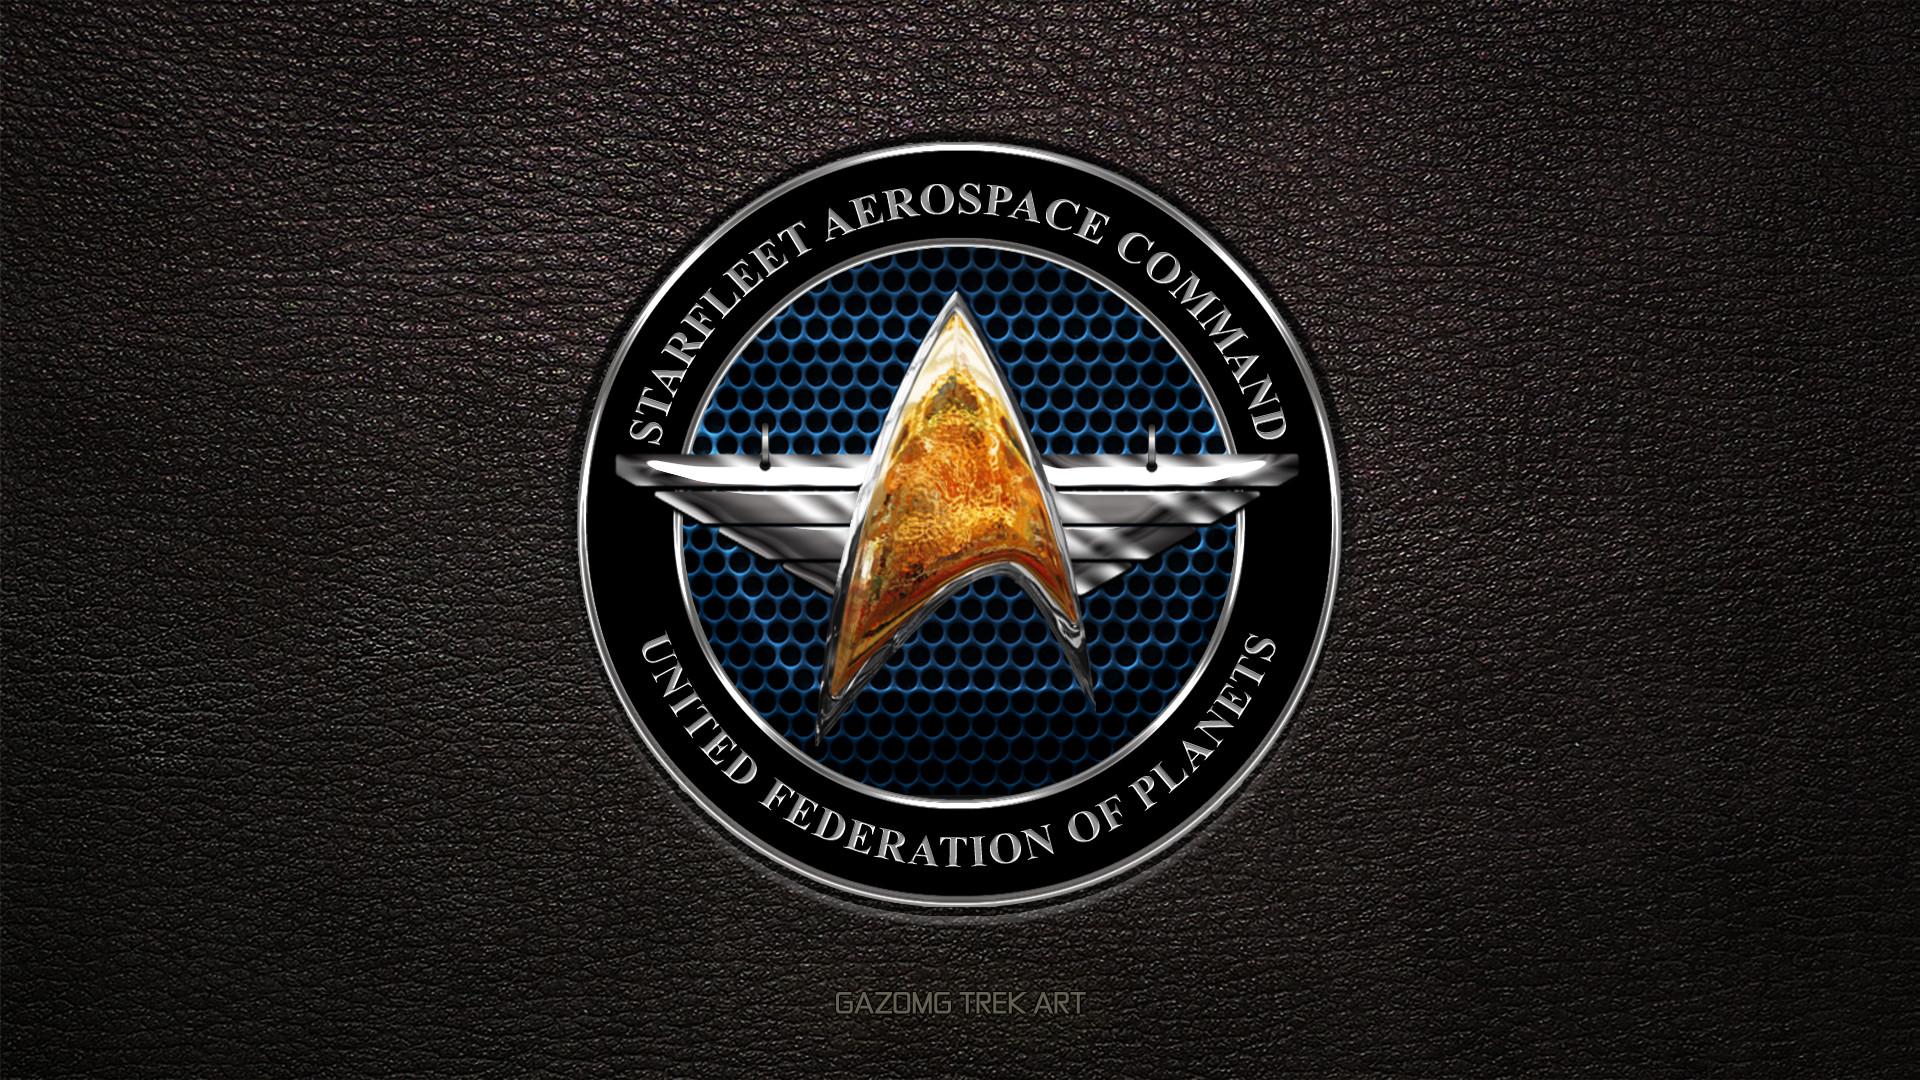 … Starfleet Aerospace Command Star Trek by gazomg